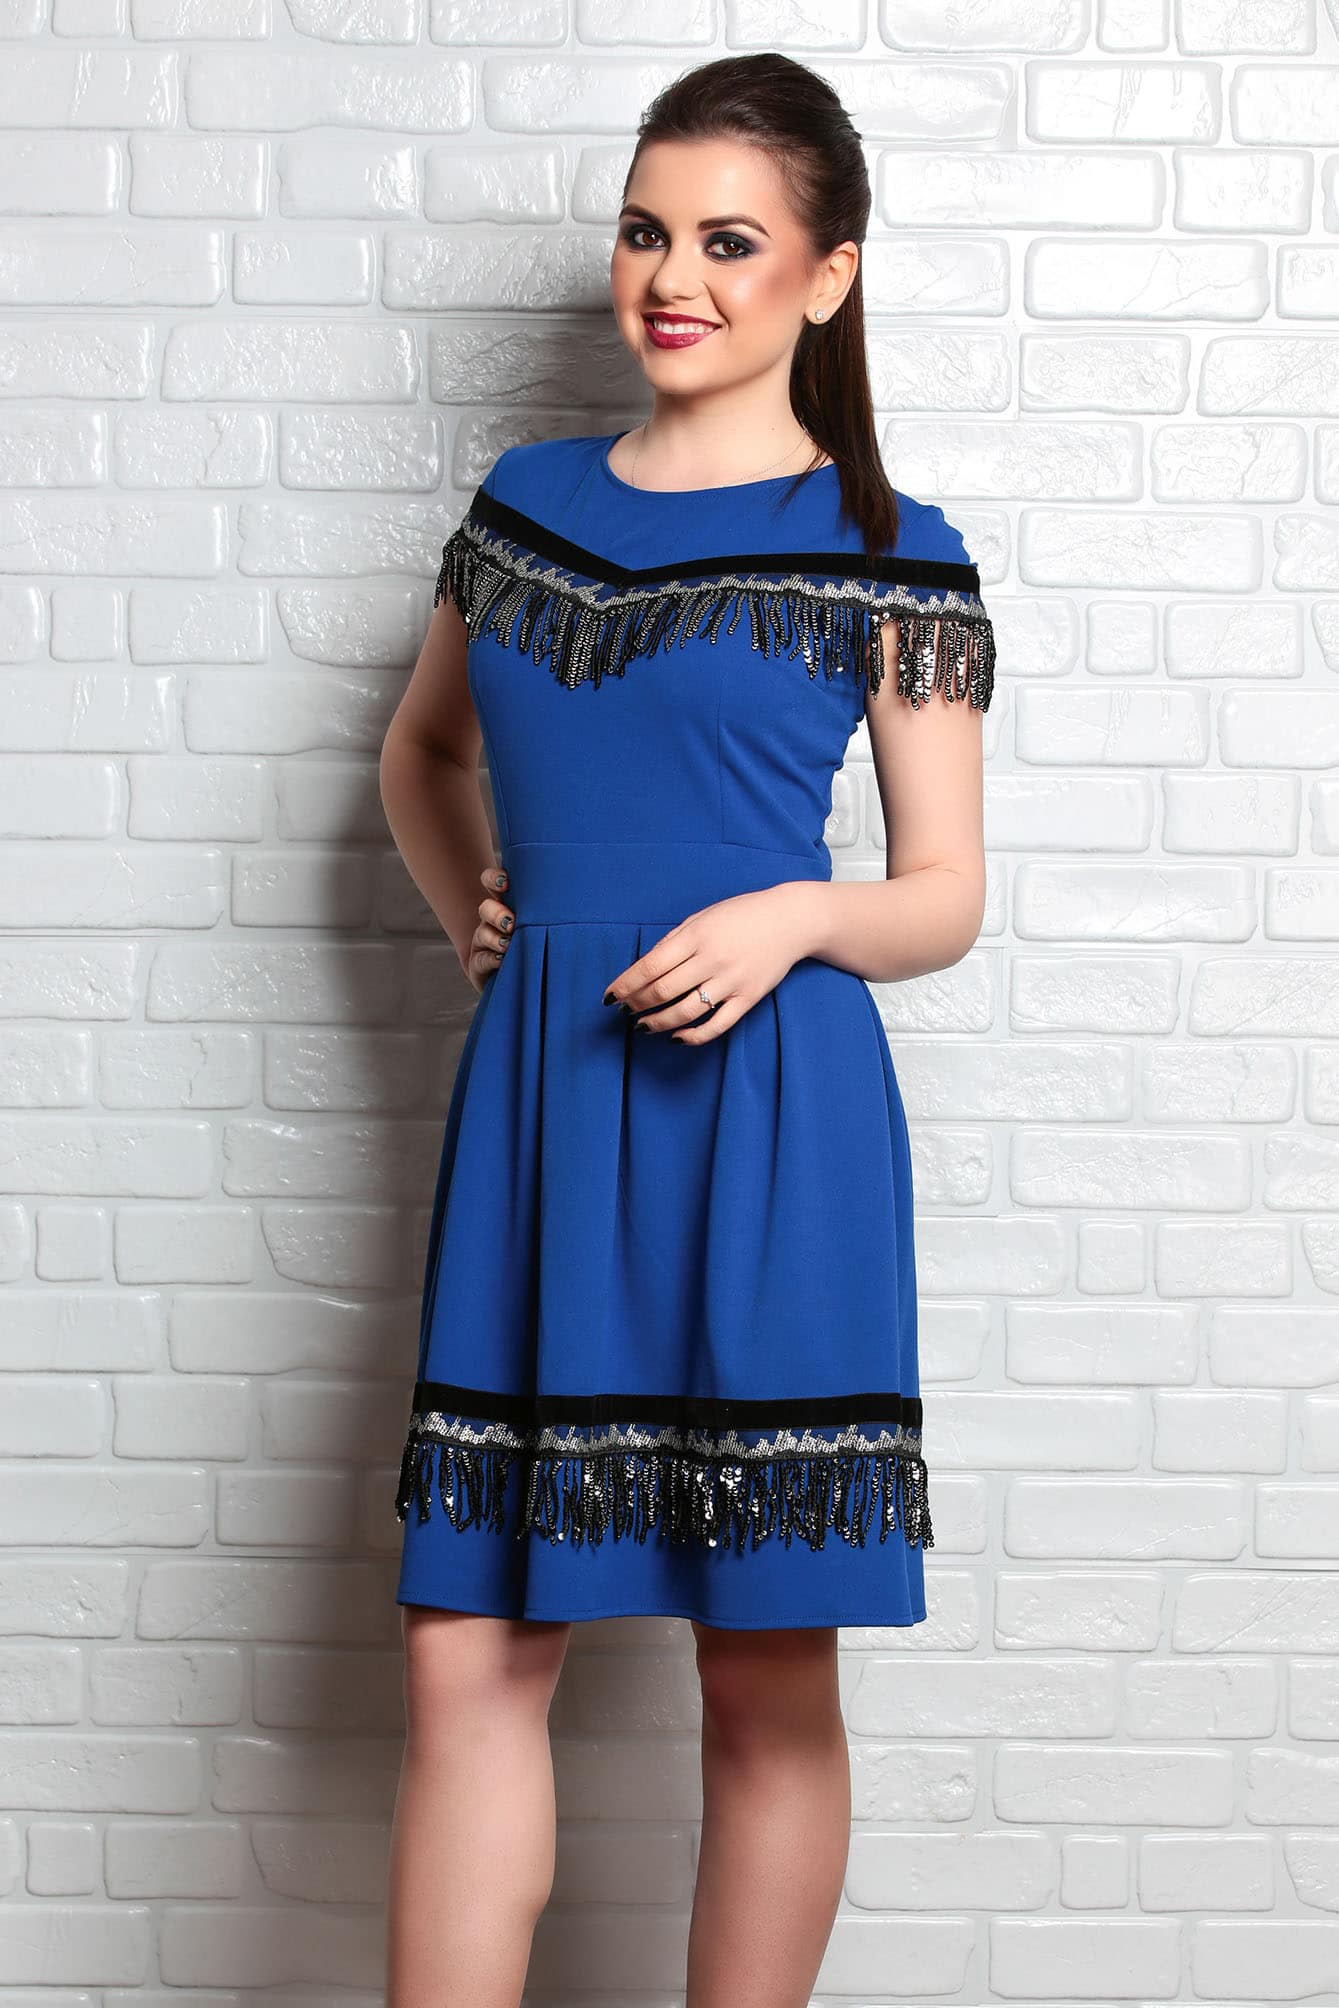 Rochie Traditionala Ilania Albastru In Clos Cu Motive Traditionale